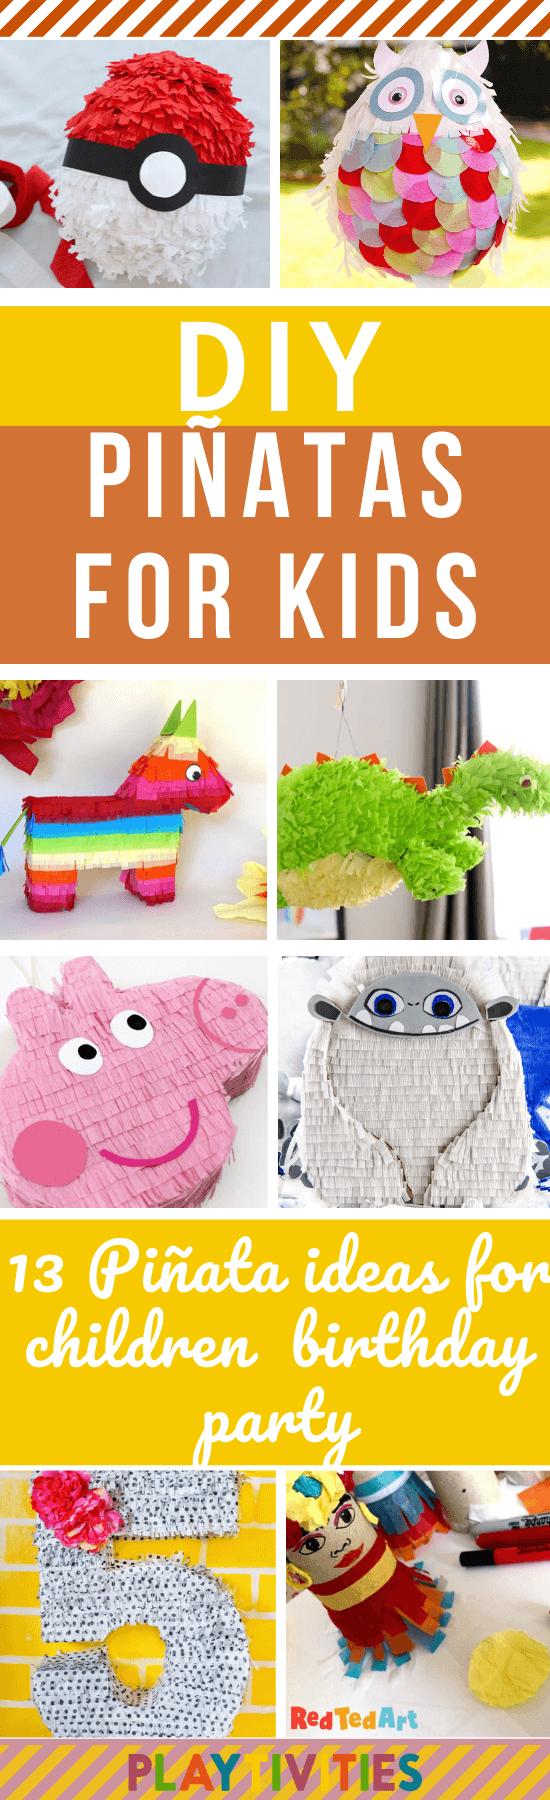 DIY Piñatas for kids